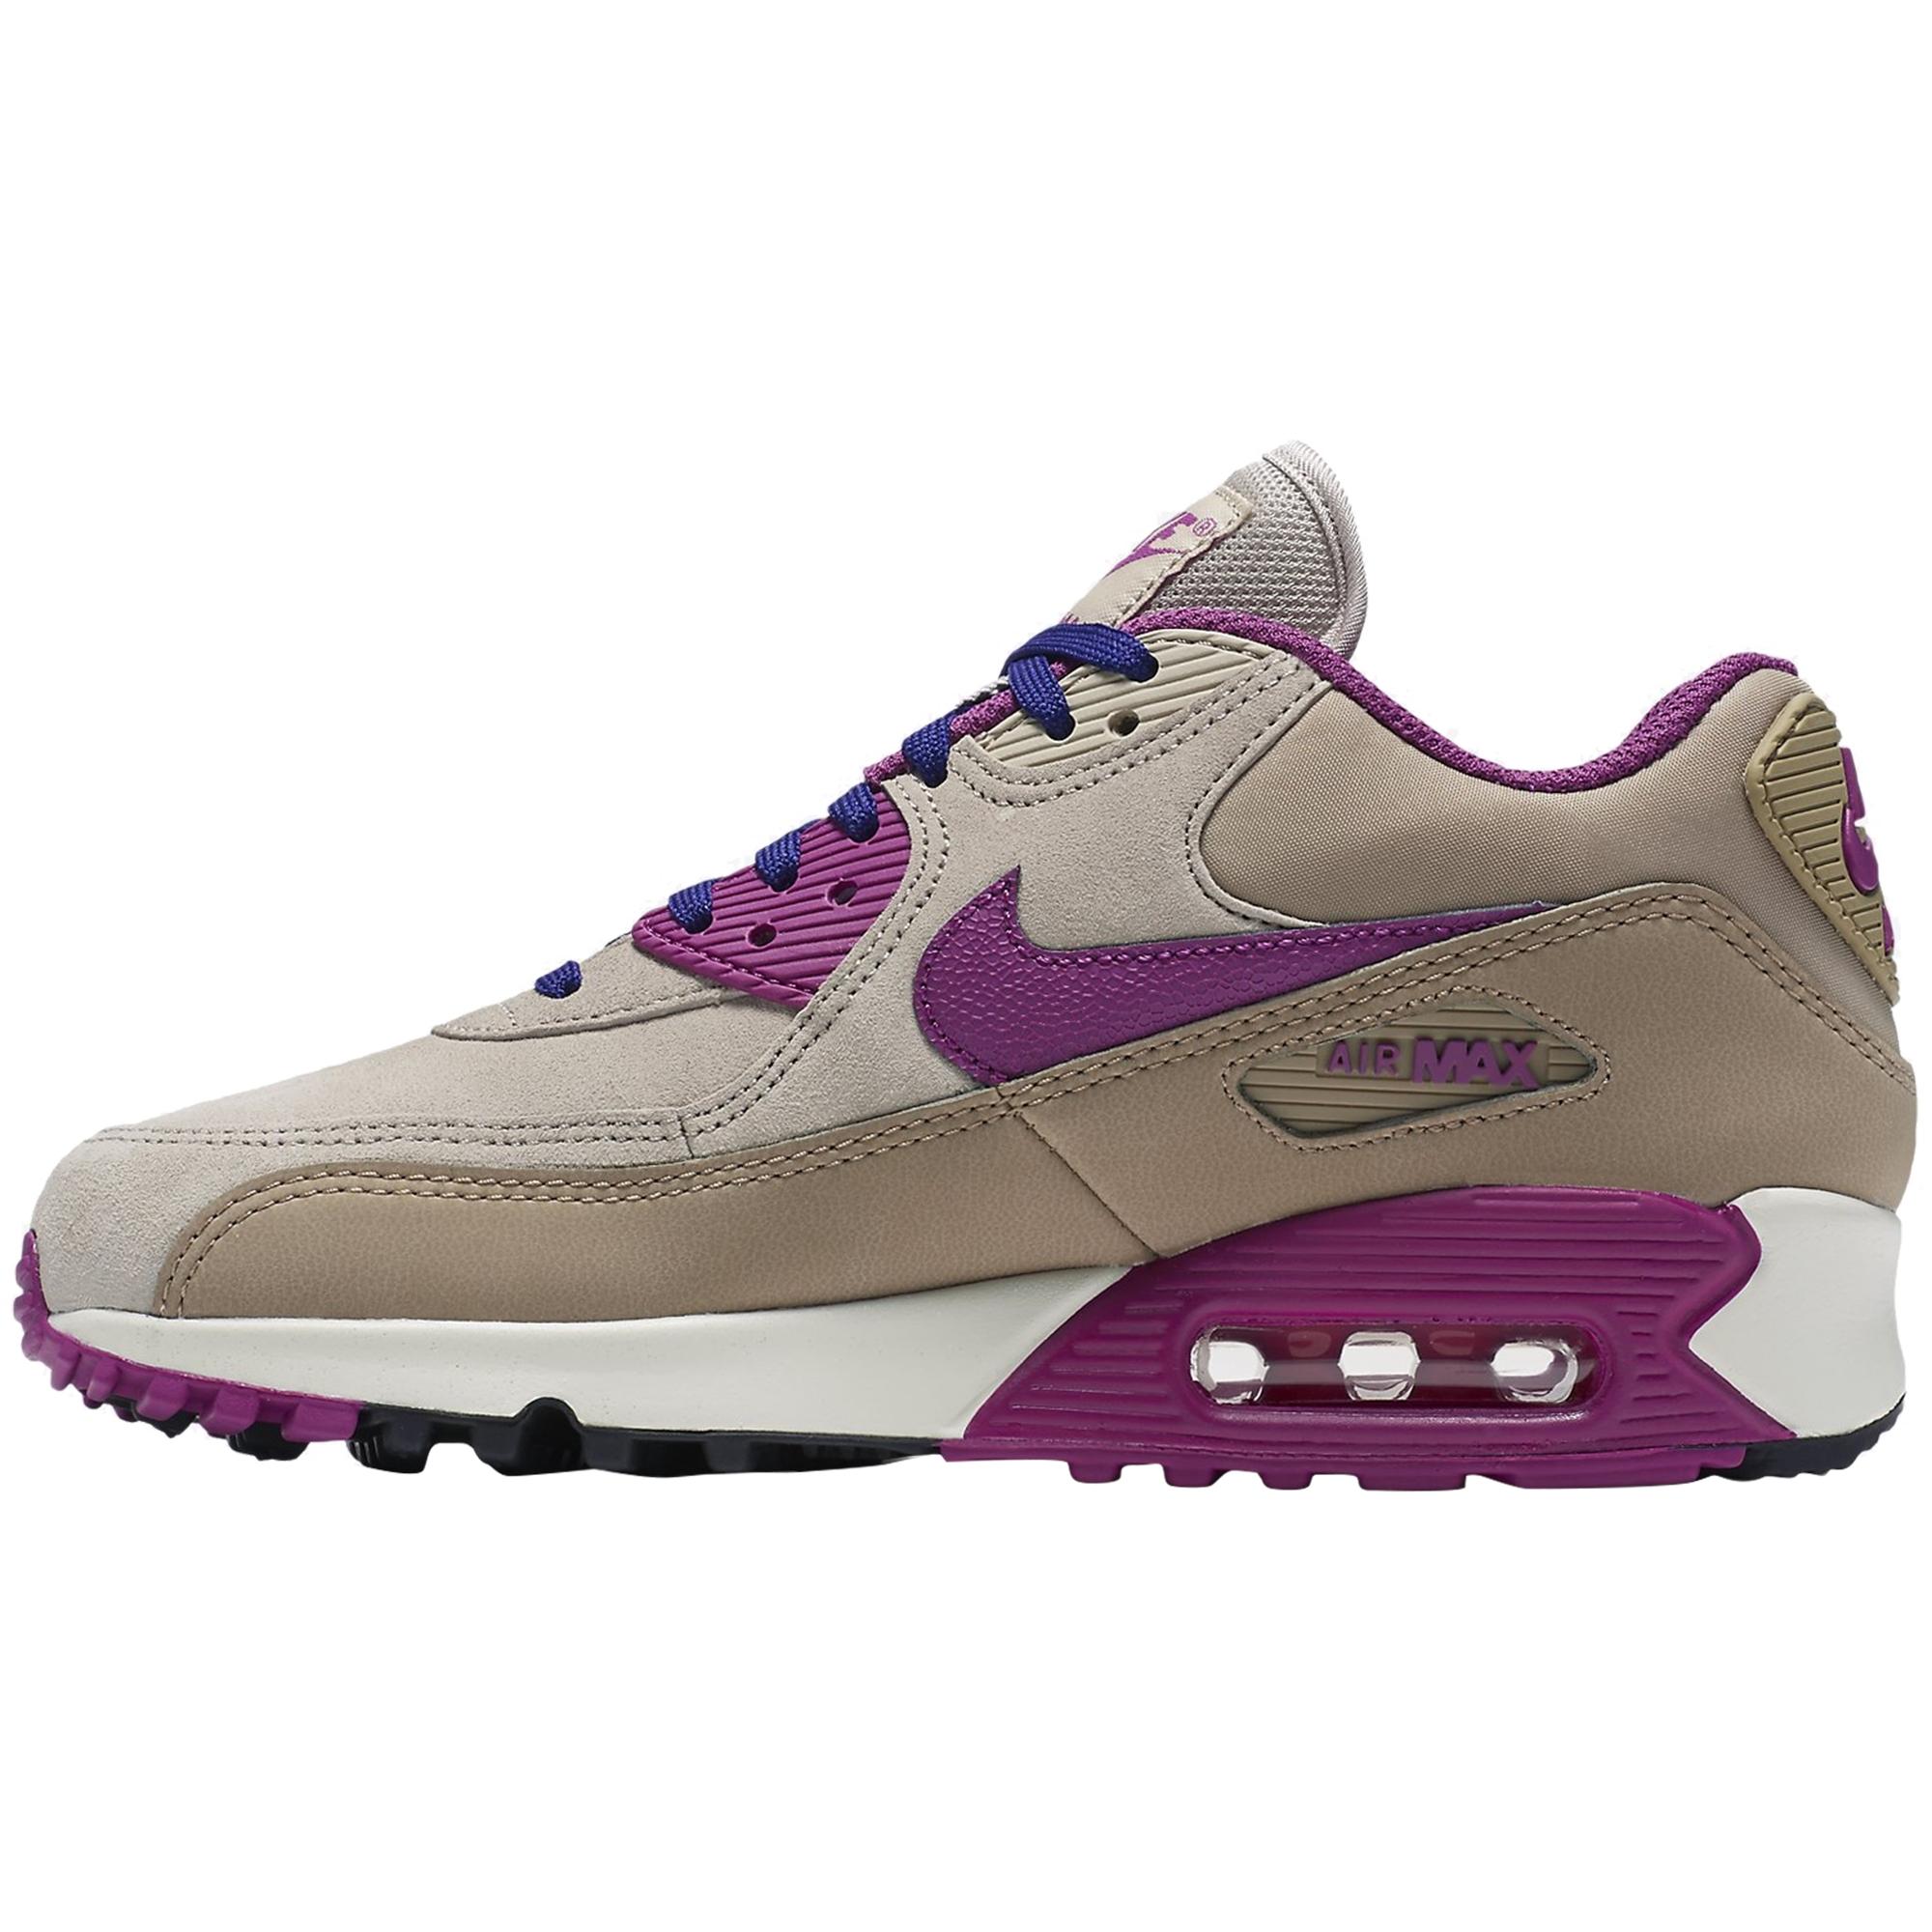 200 Leather Kadın Max Spor 90 Nike Air Ayakkabı768887 08wPkXNOZn